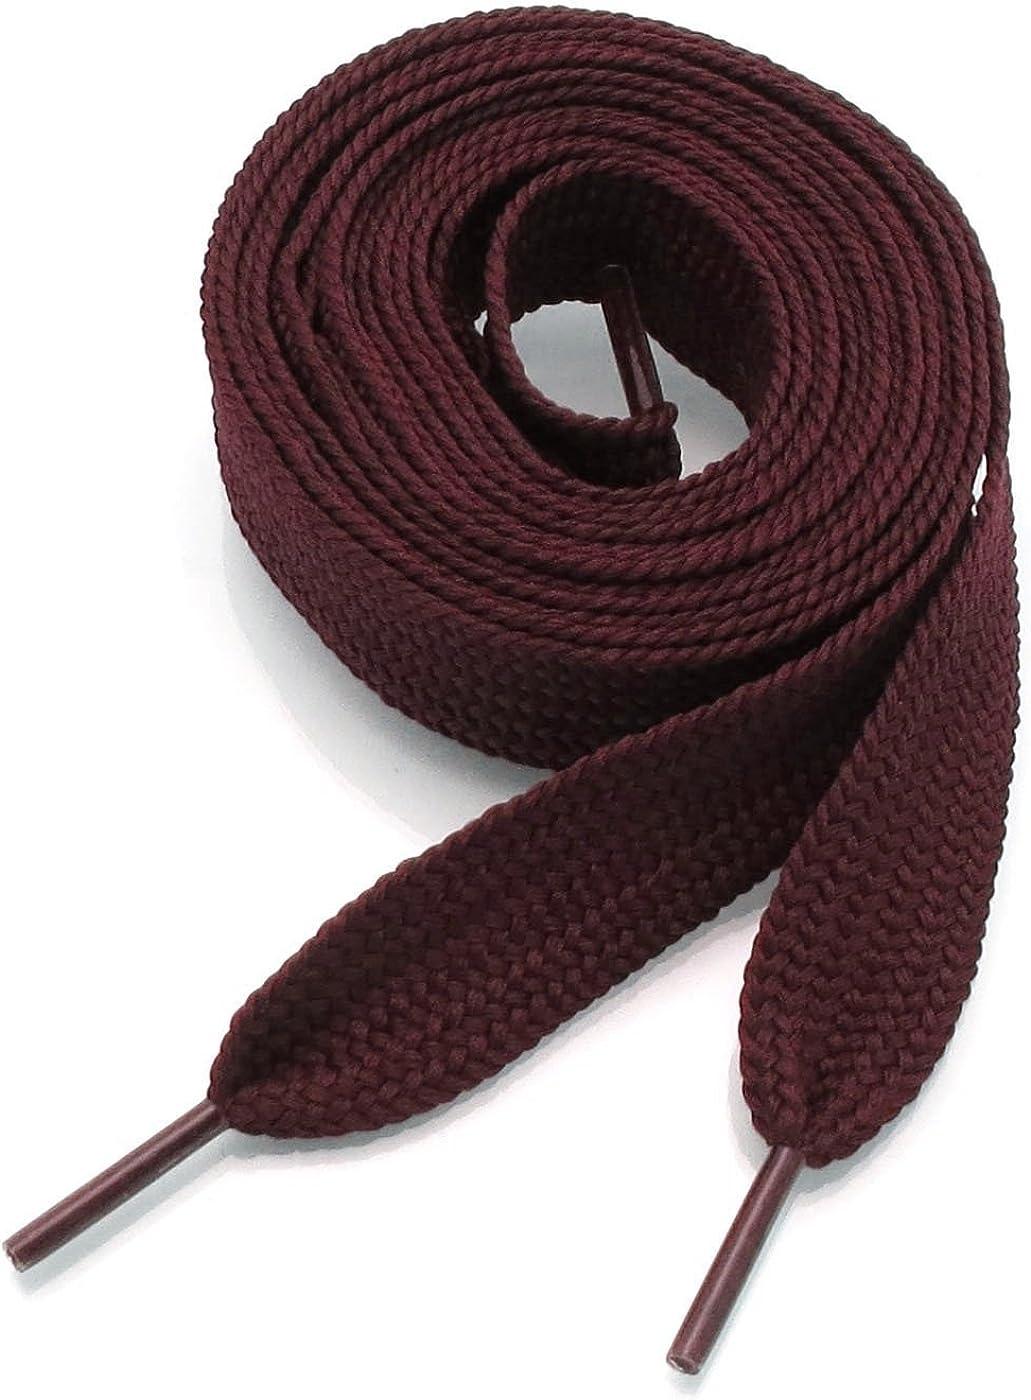 Amazon Com Shoe Laces Flat Thick 52 Inches Long Burgundy Shoelaces Shoes